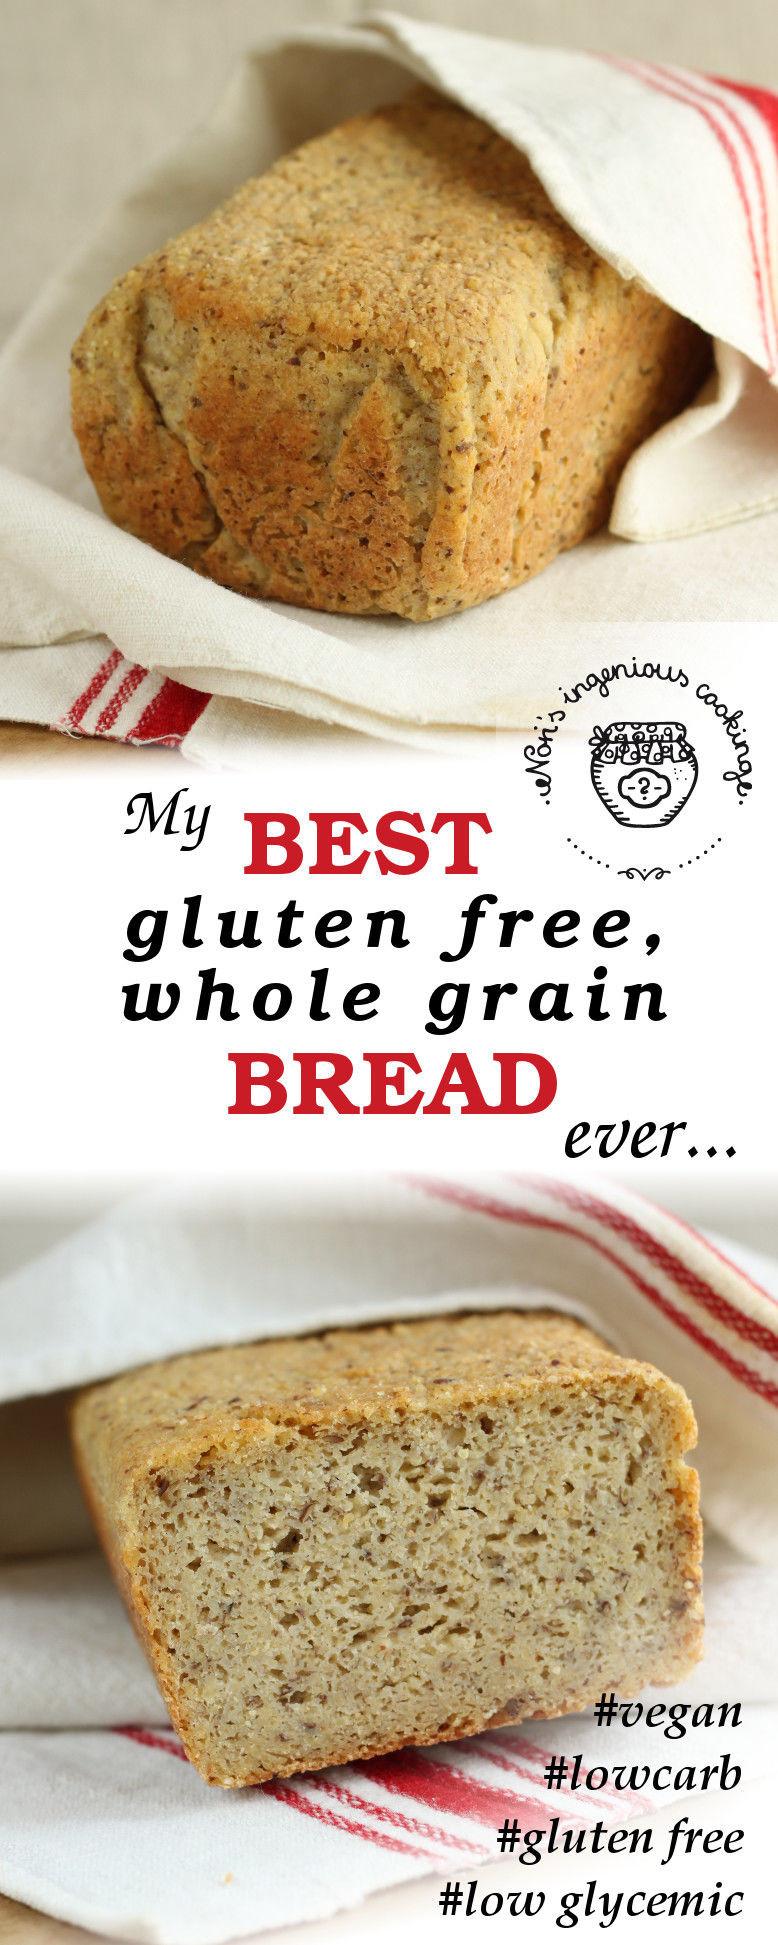 Gluten Free Vegan Bread Recipe  My best gluten free whole grain bread ever vegan